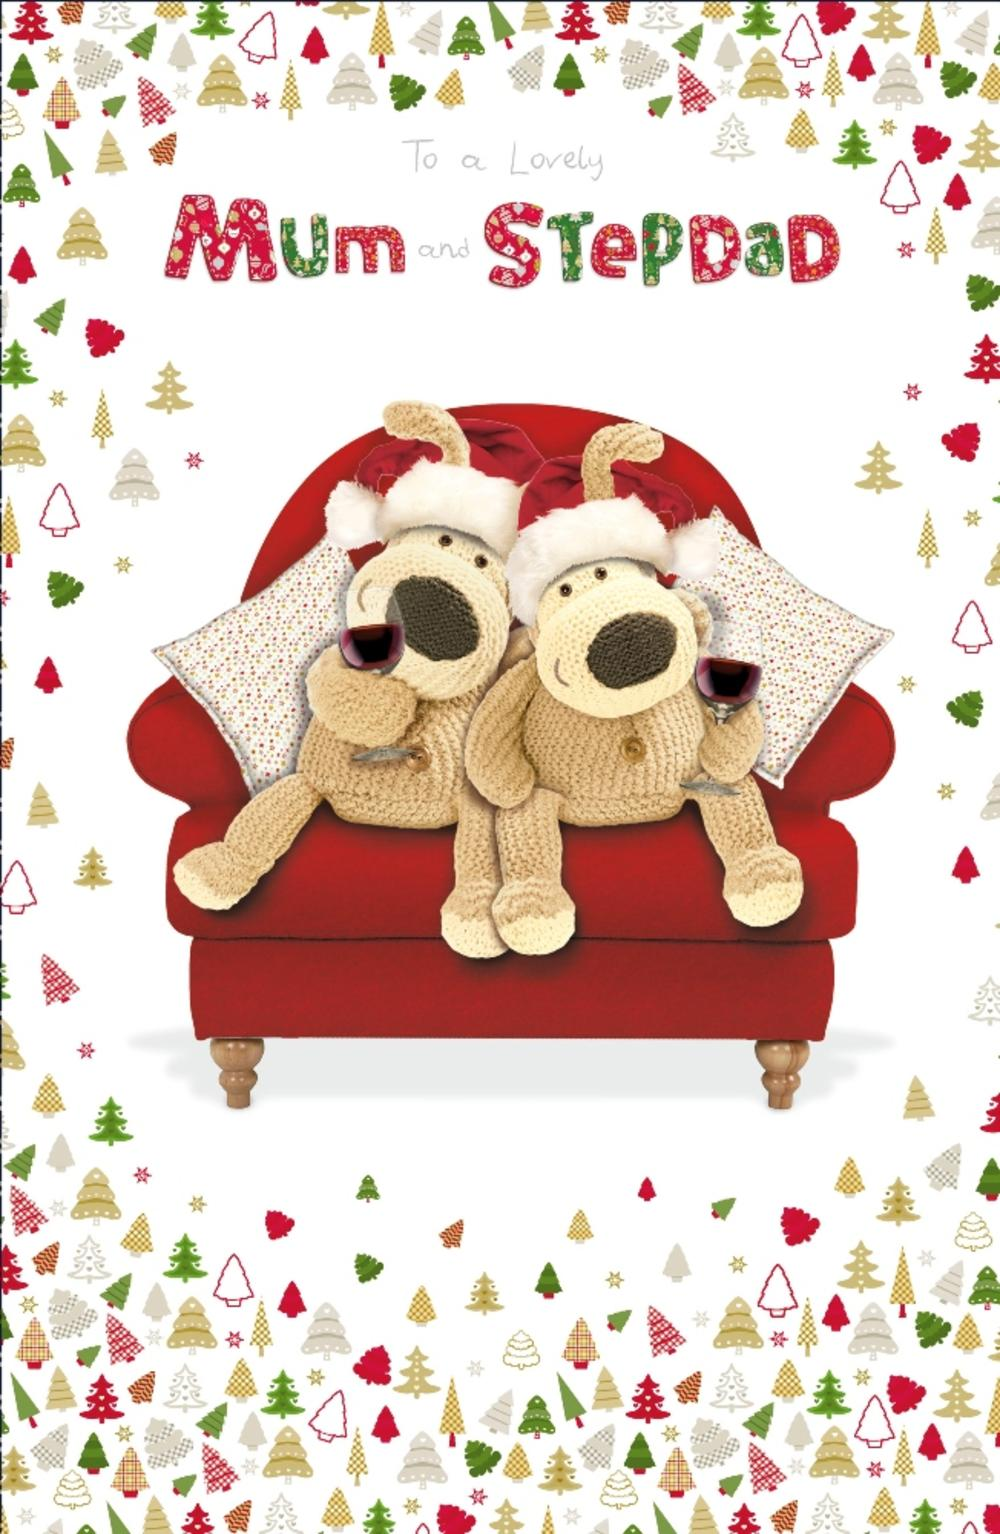 Boofle Mum & Stepdad Christmas Greeting Card